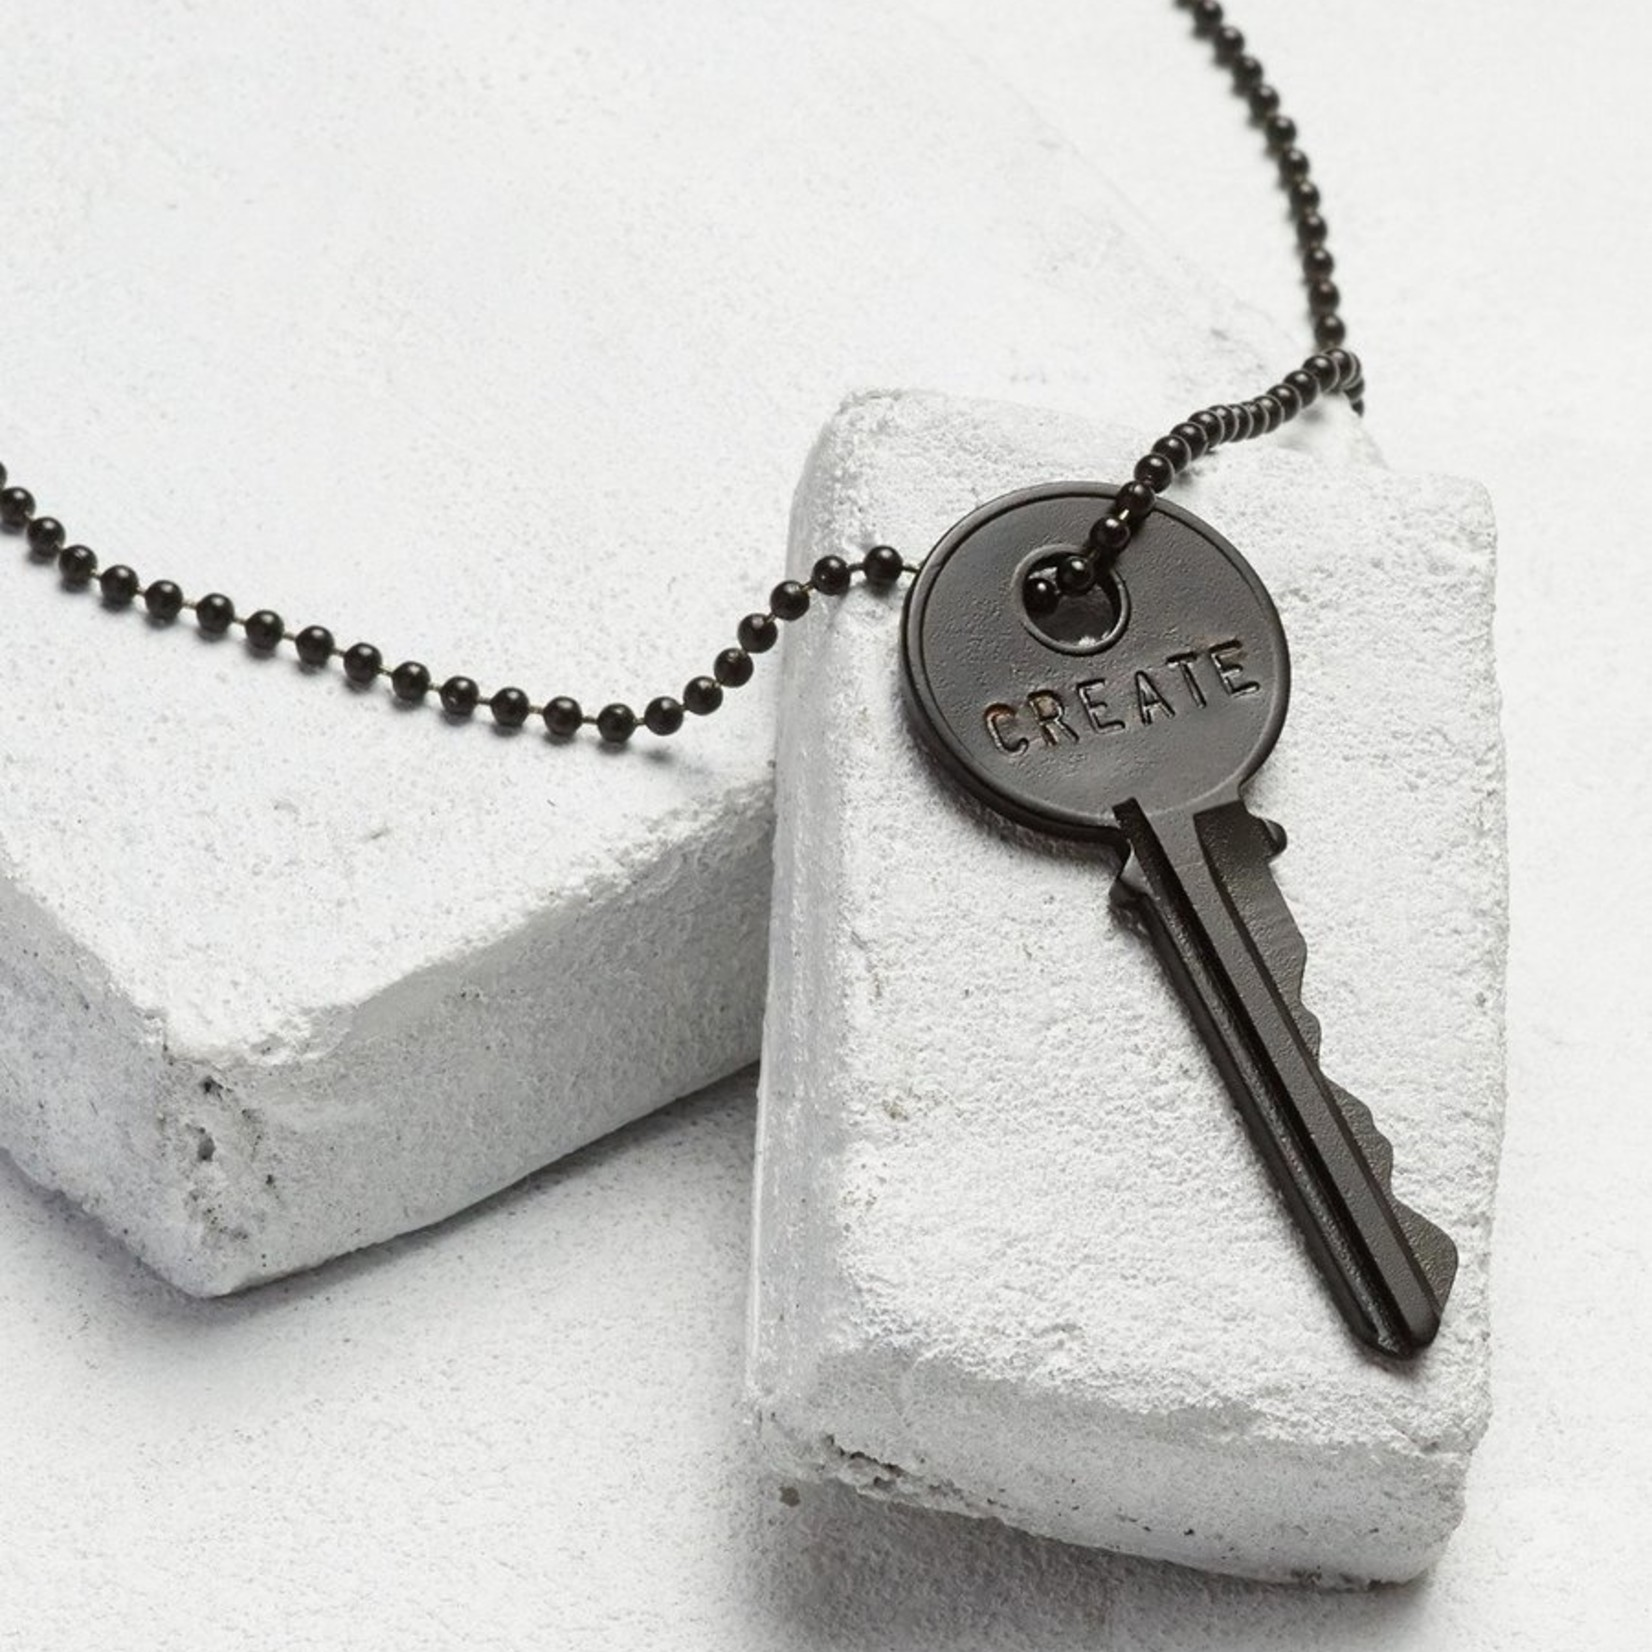 The Giving Keys Matte Black Key Necklace